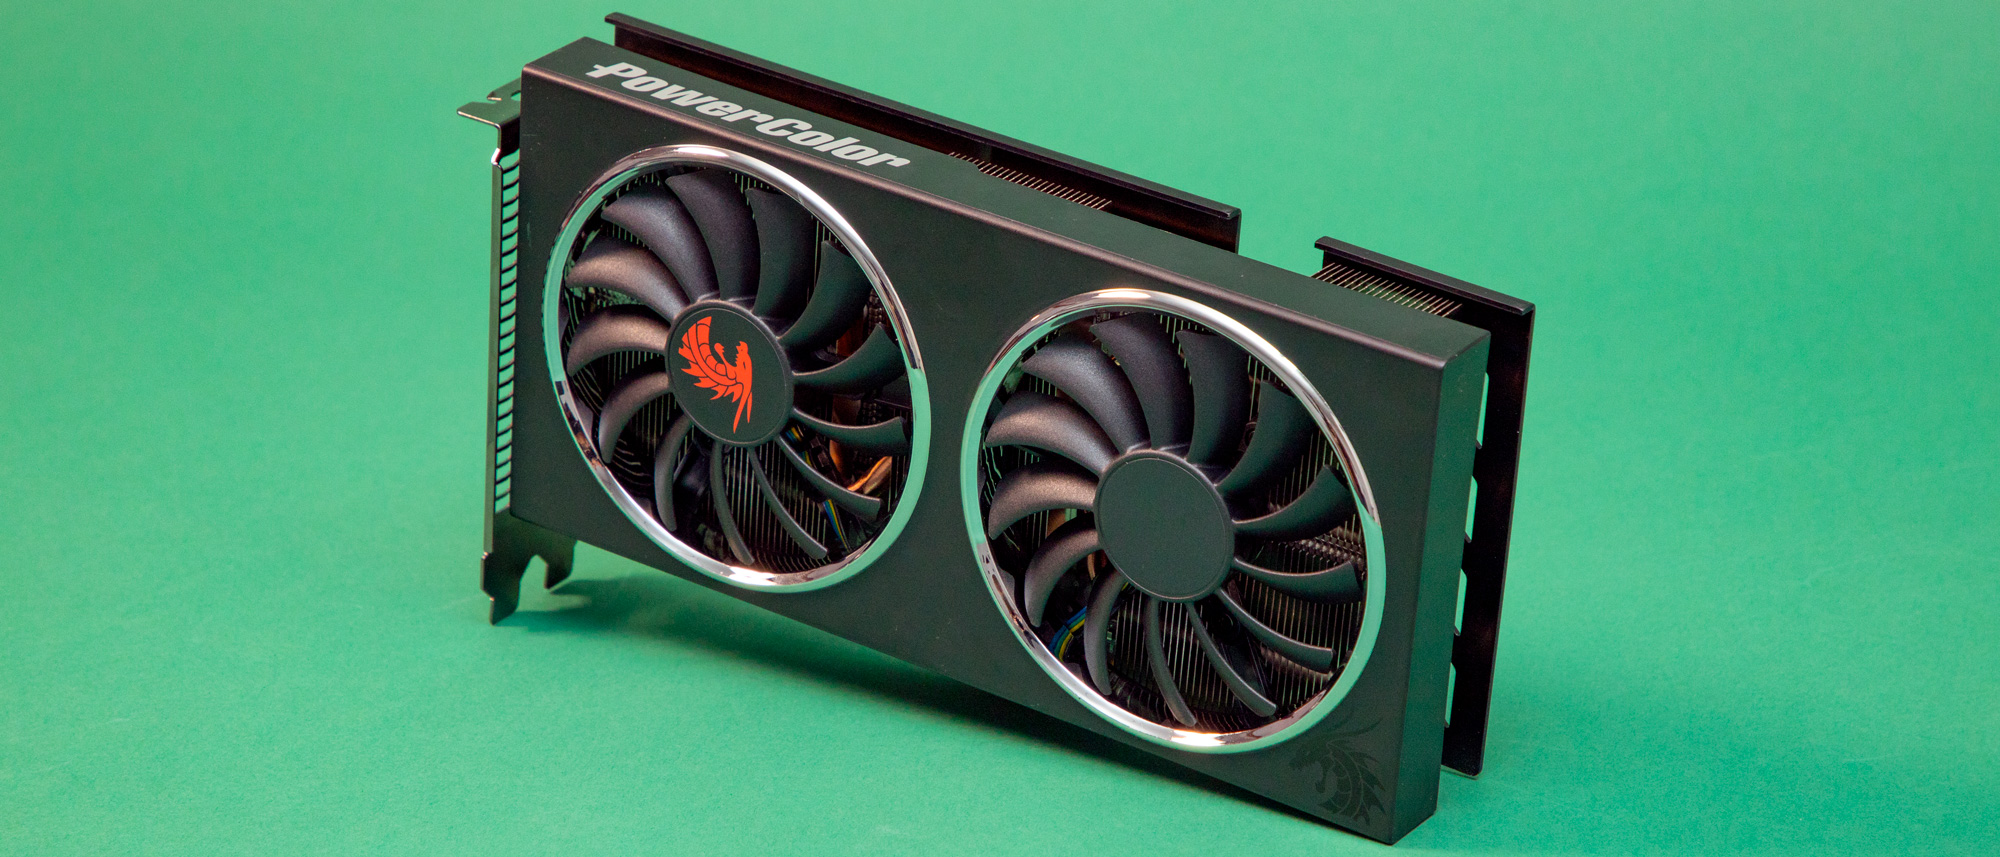 Amd Radeon Rx 5500 Xt Review Techradar